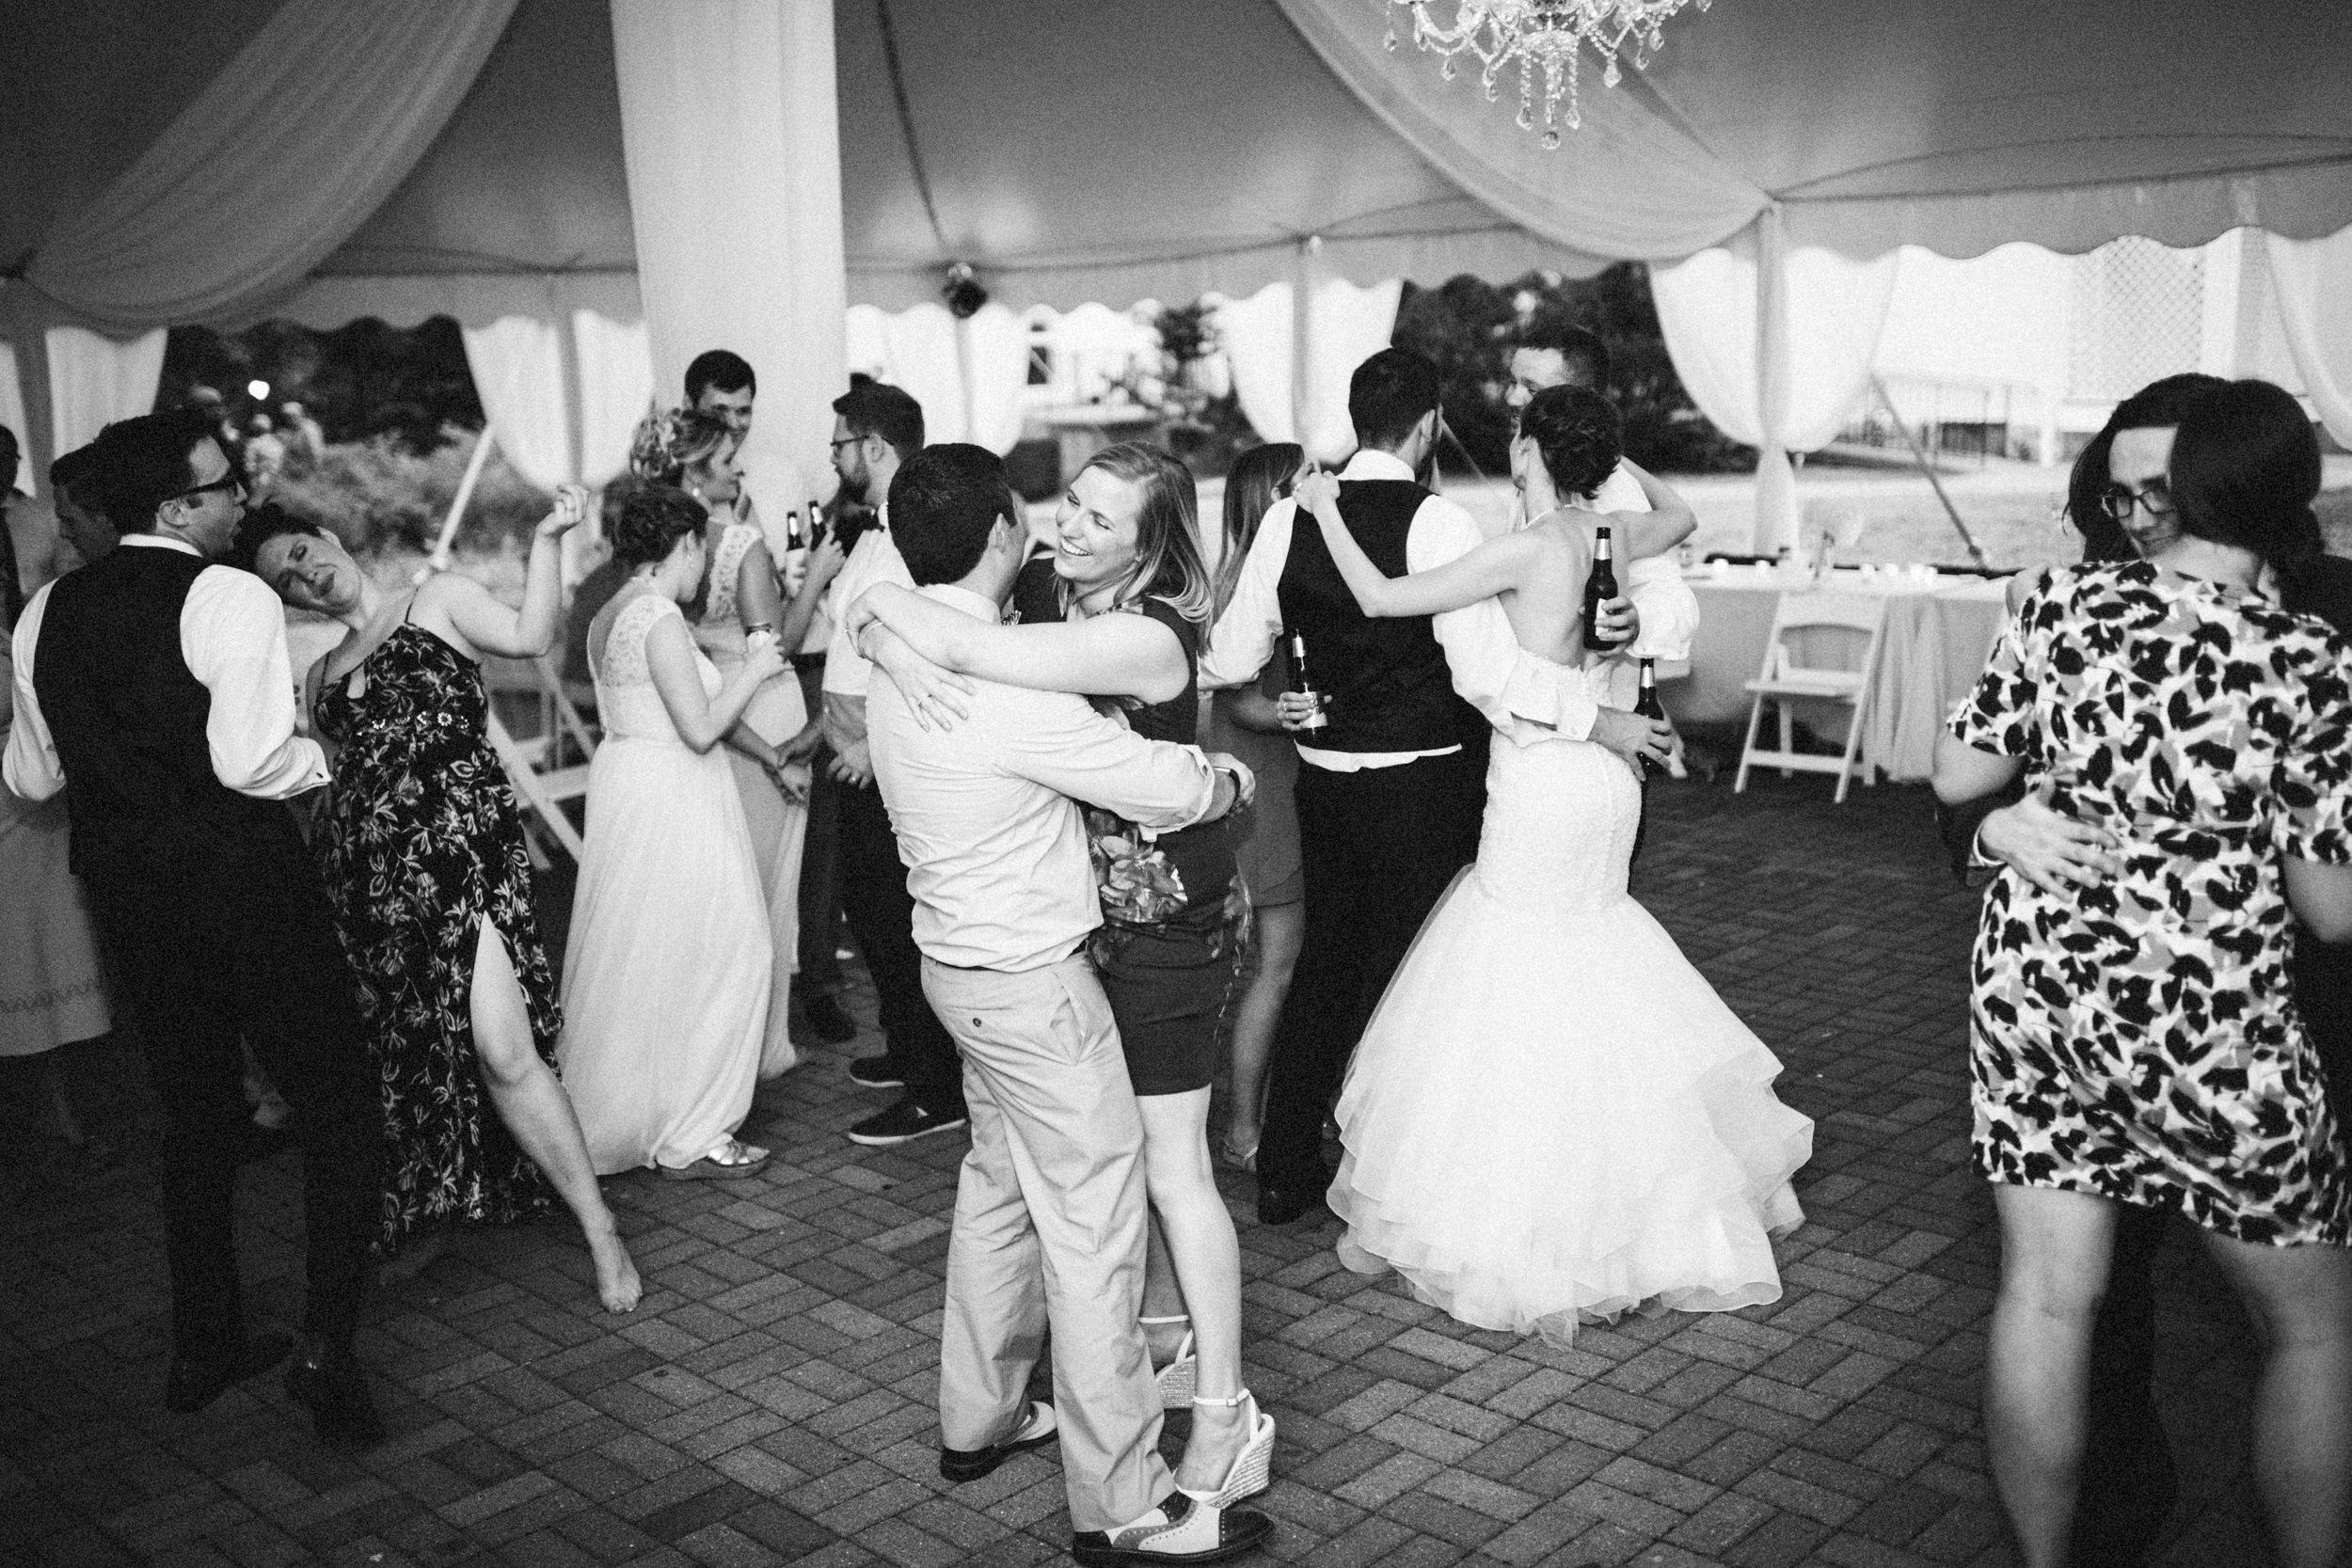 Louisville-Kentucky-Wedding-Elopement-Photographer-Sarah-Katherine-Davis-Photography-Whitehall-Classic-Timeless-Garden-Wedding-820.jpg